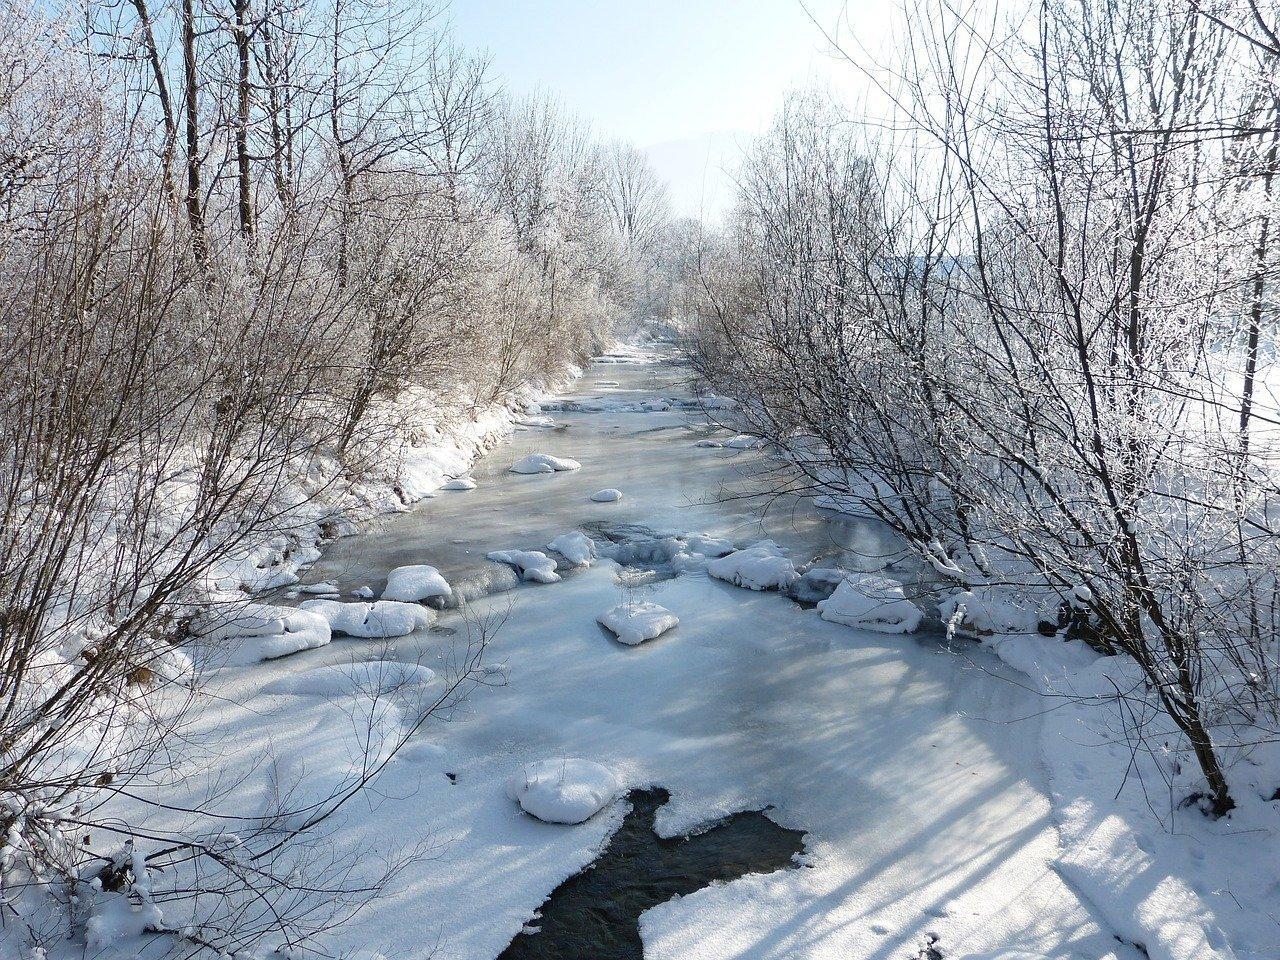 Gefrorener Fluss | Quelle: Pixabay